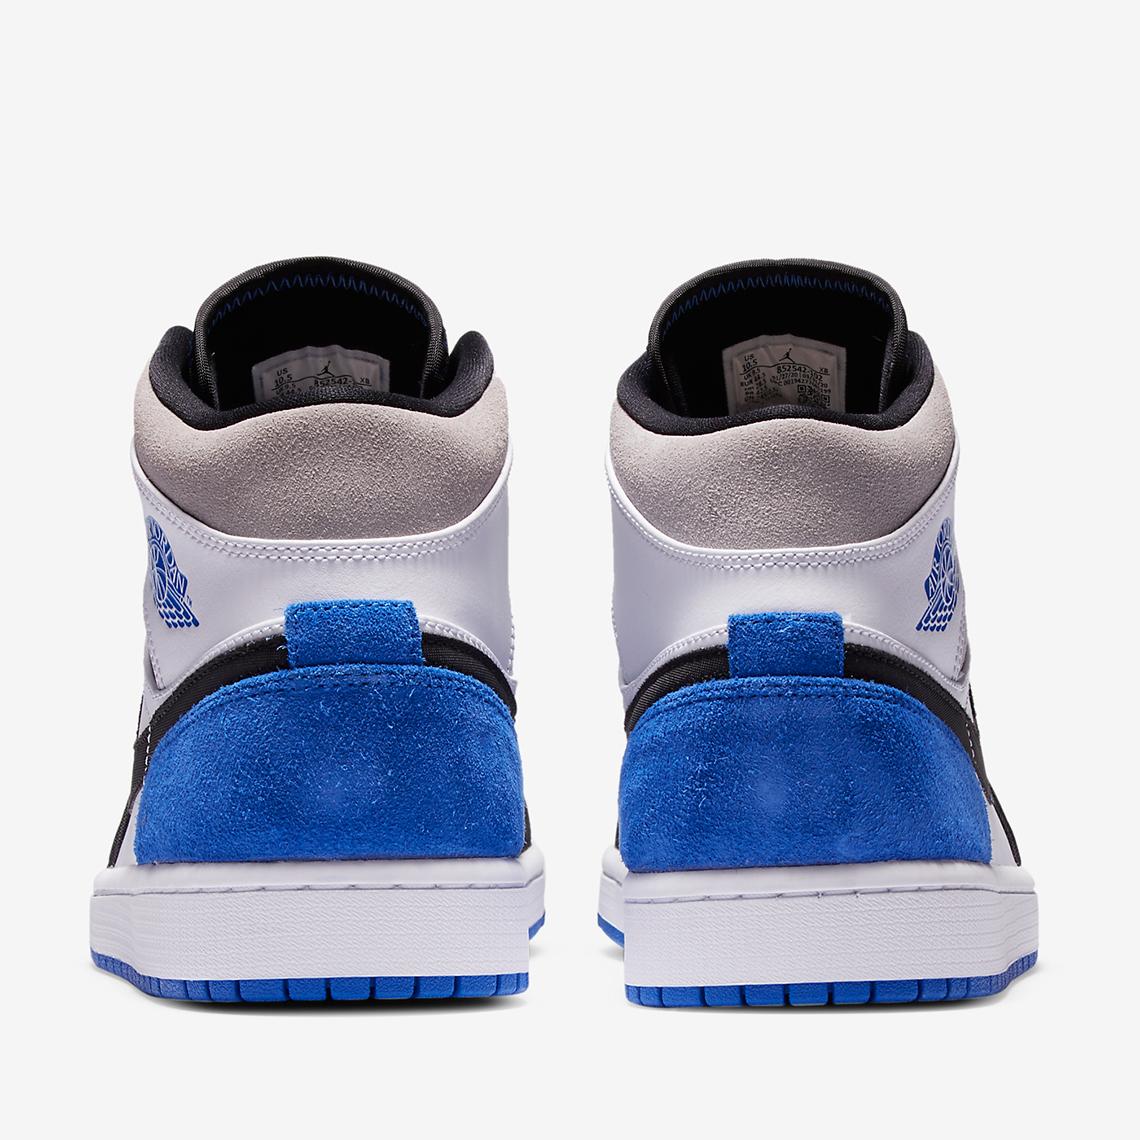 Air Jordan 1 Mid SE Royal 852542-102 Release Info | SneakerNews.com